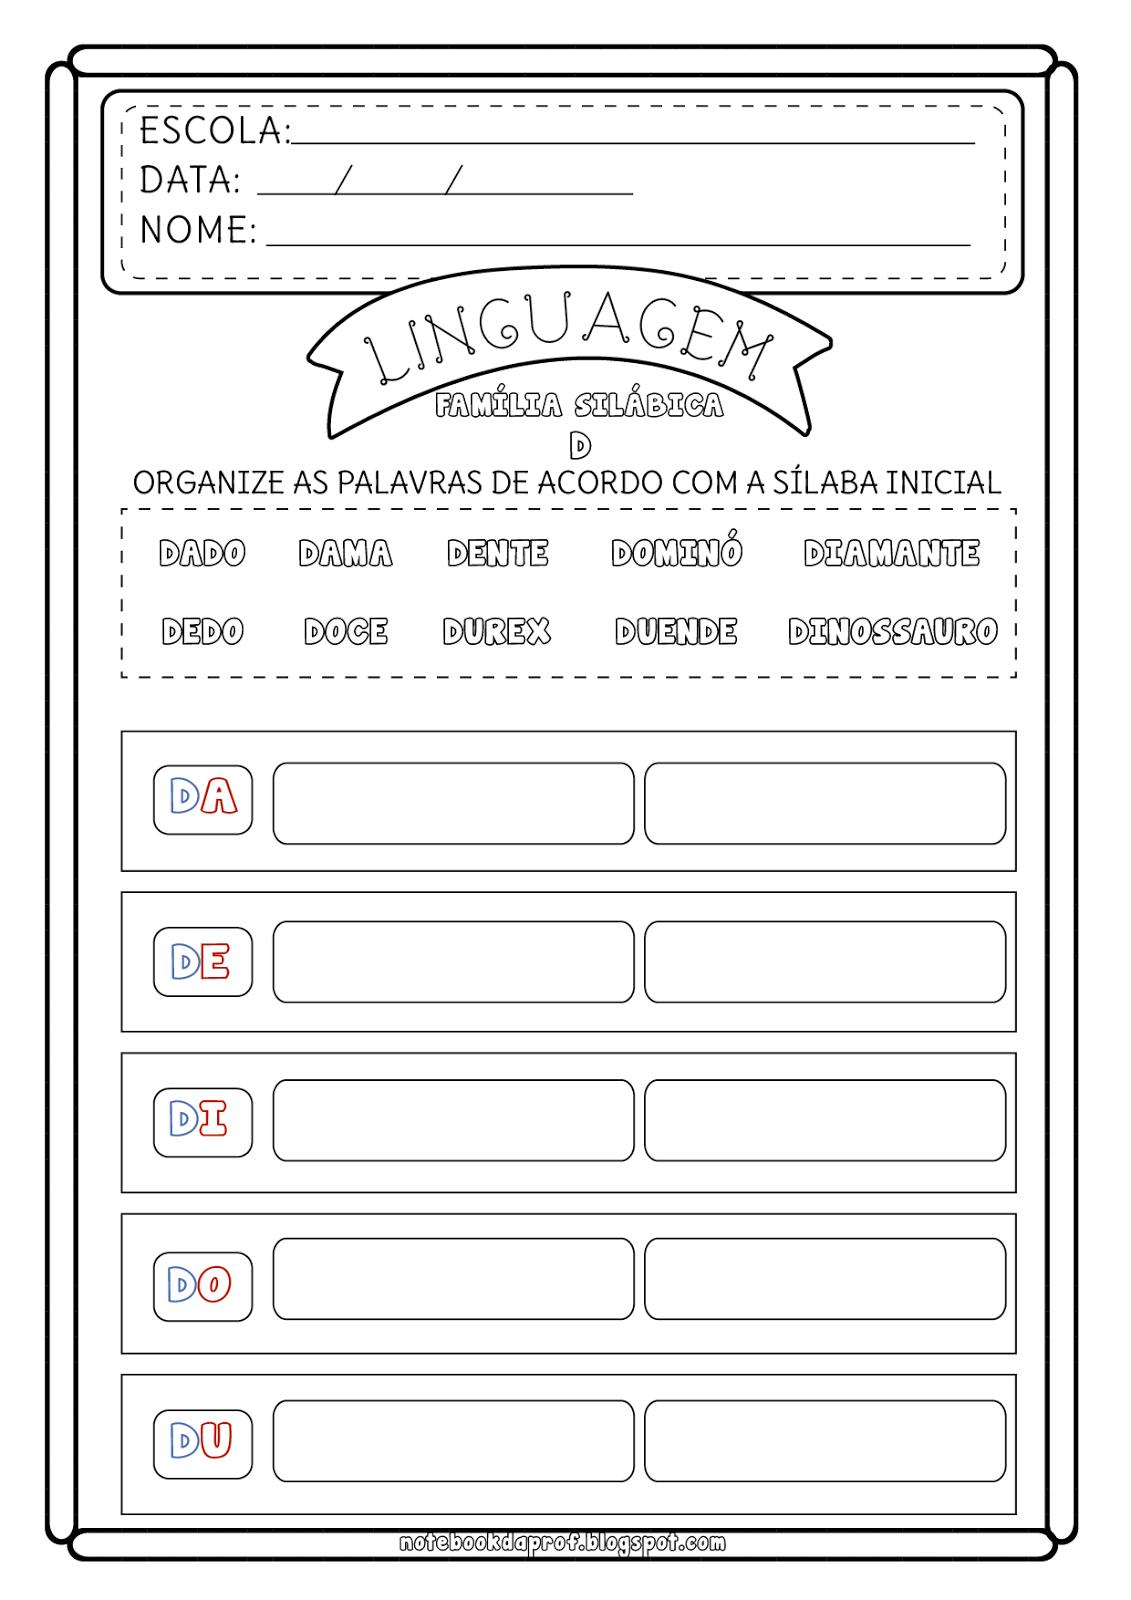 Notebook Da Profa Atividade Familia Silabica D